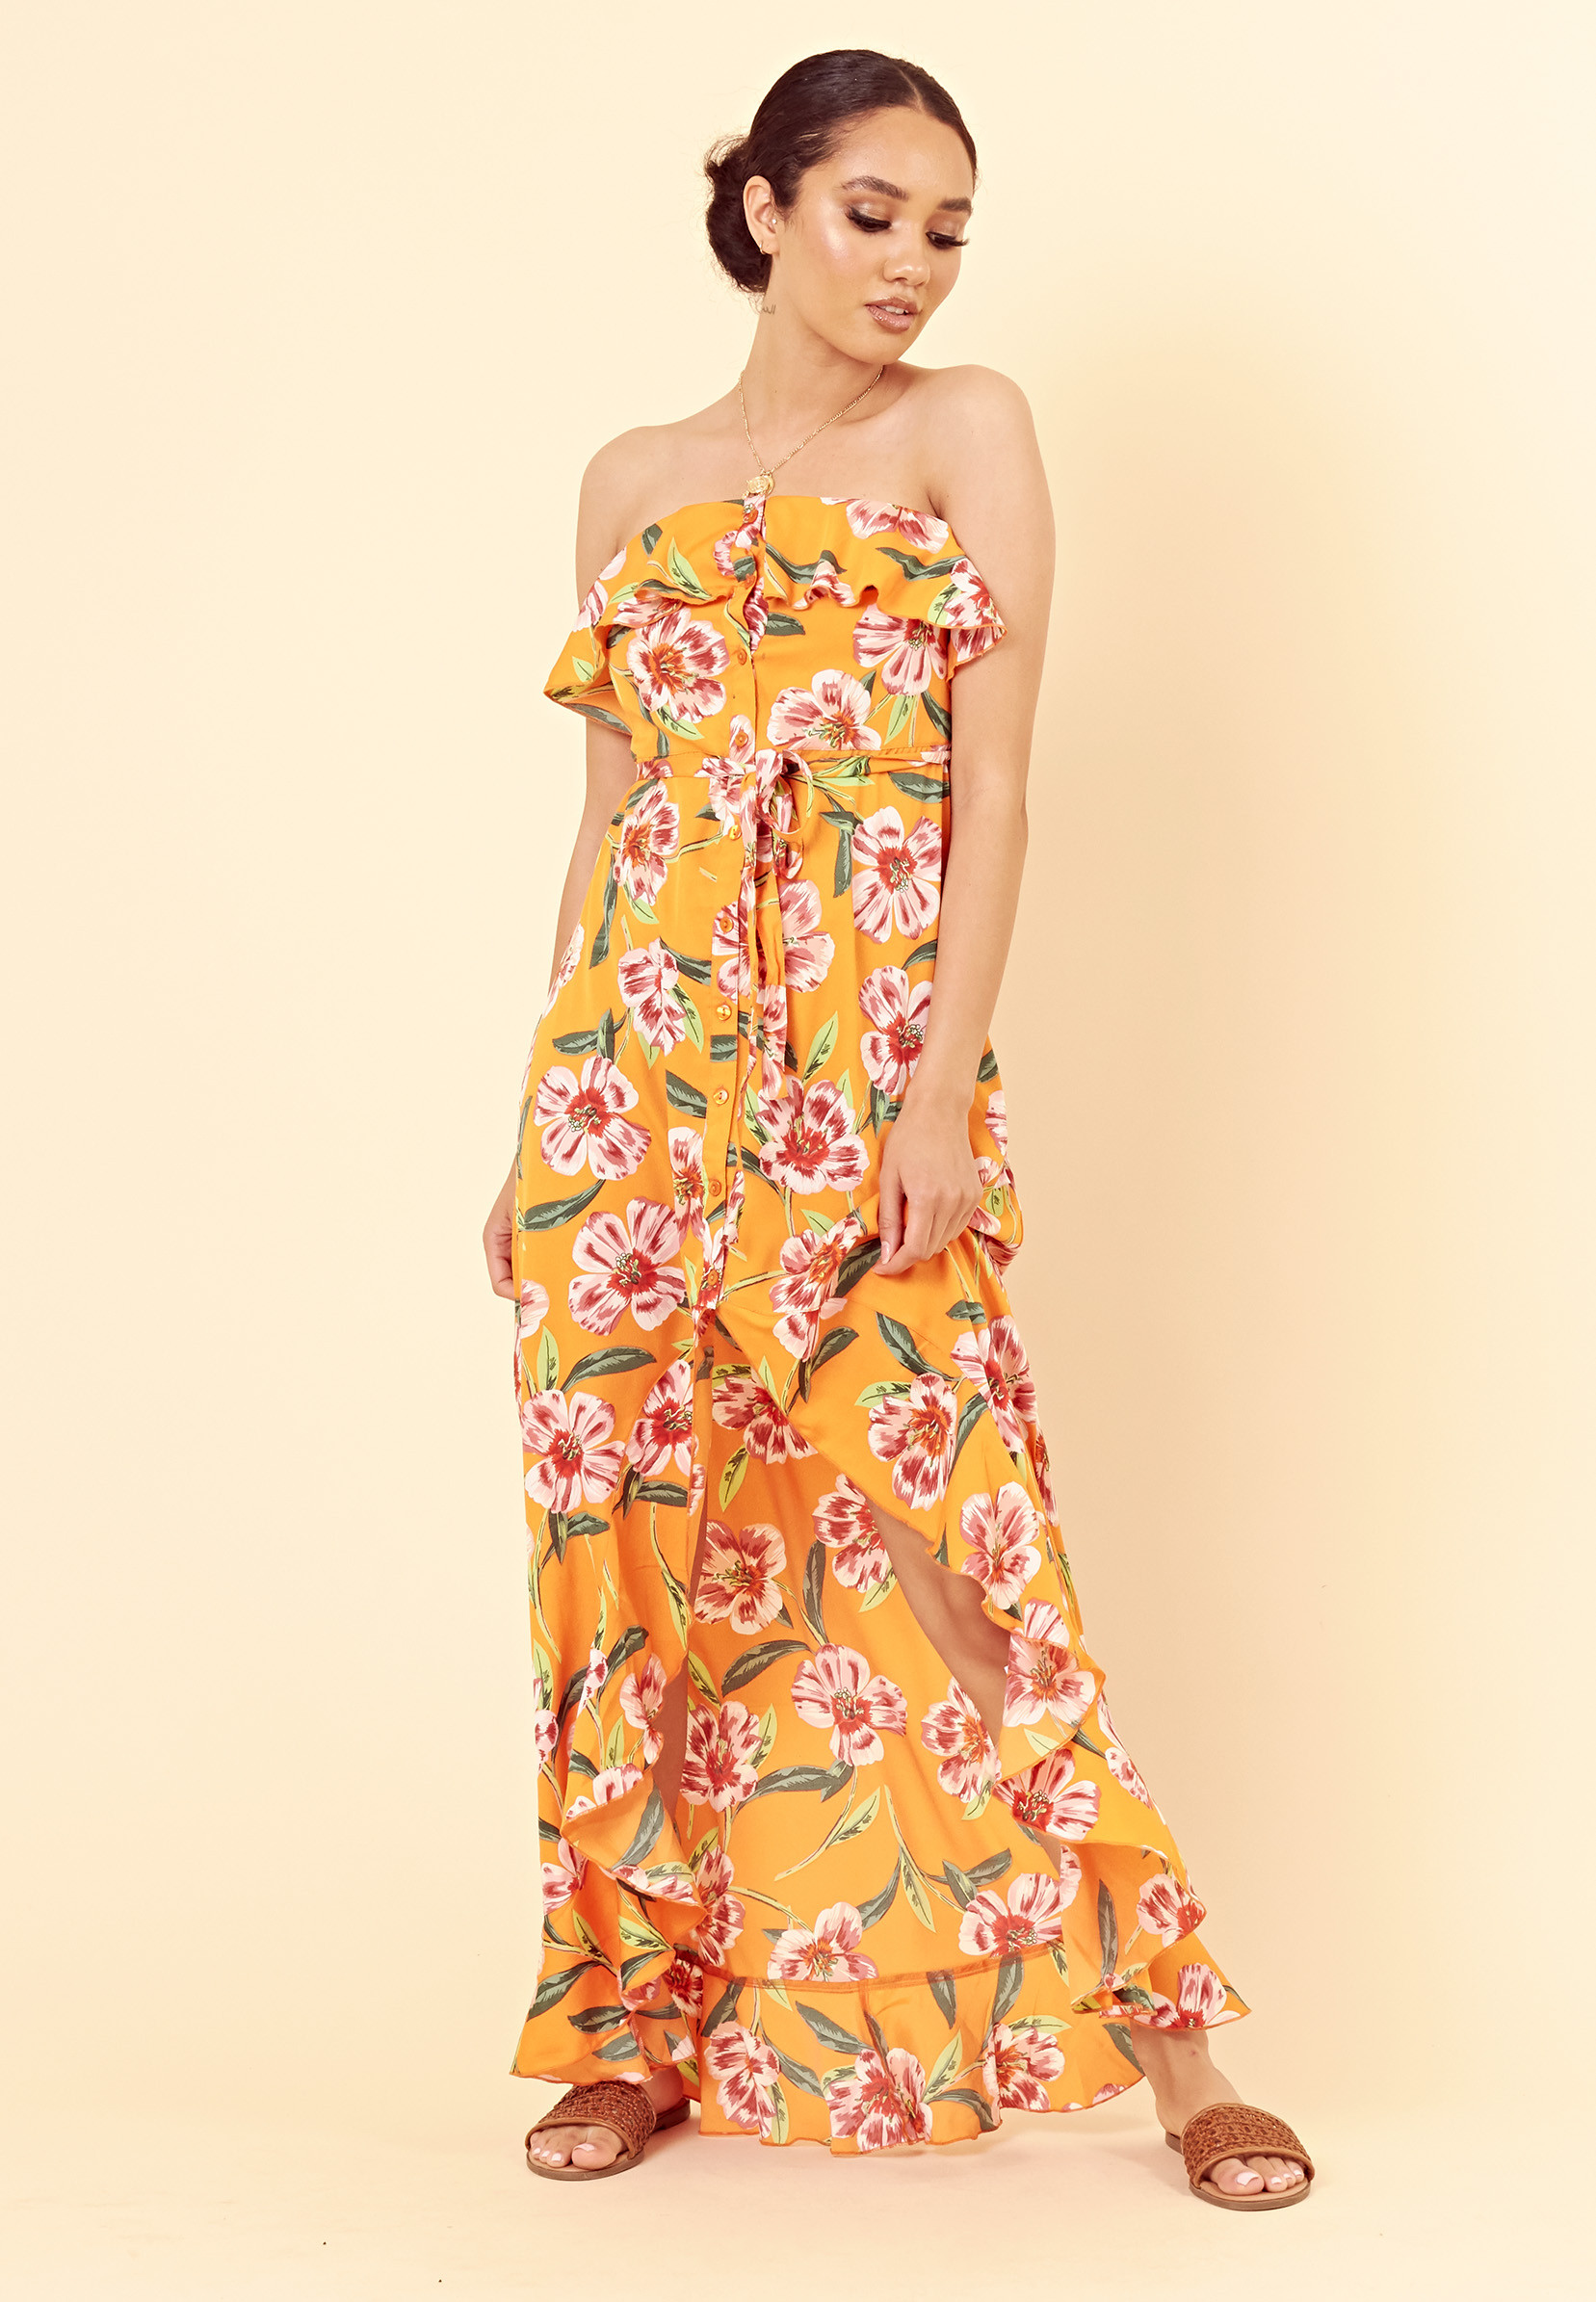 dcf57787e Orange Floral Bardot Bandeau Button Down Maxi Dress with Frill l Influence  Fashion Wholesale New Season SS19